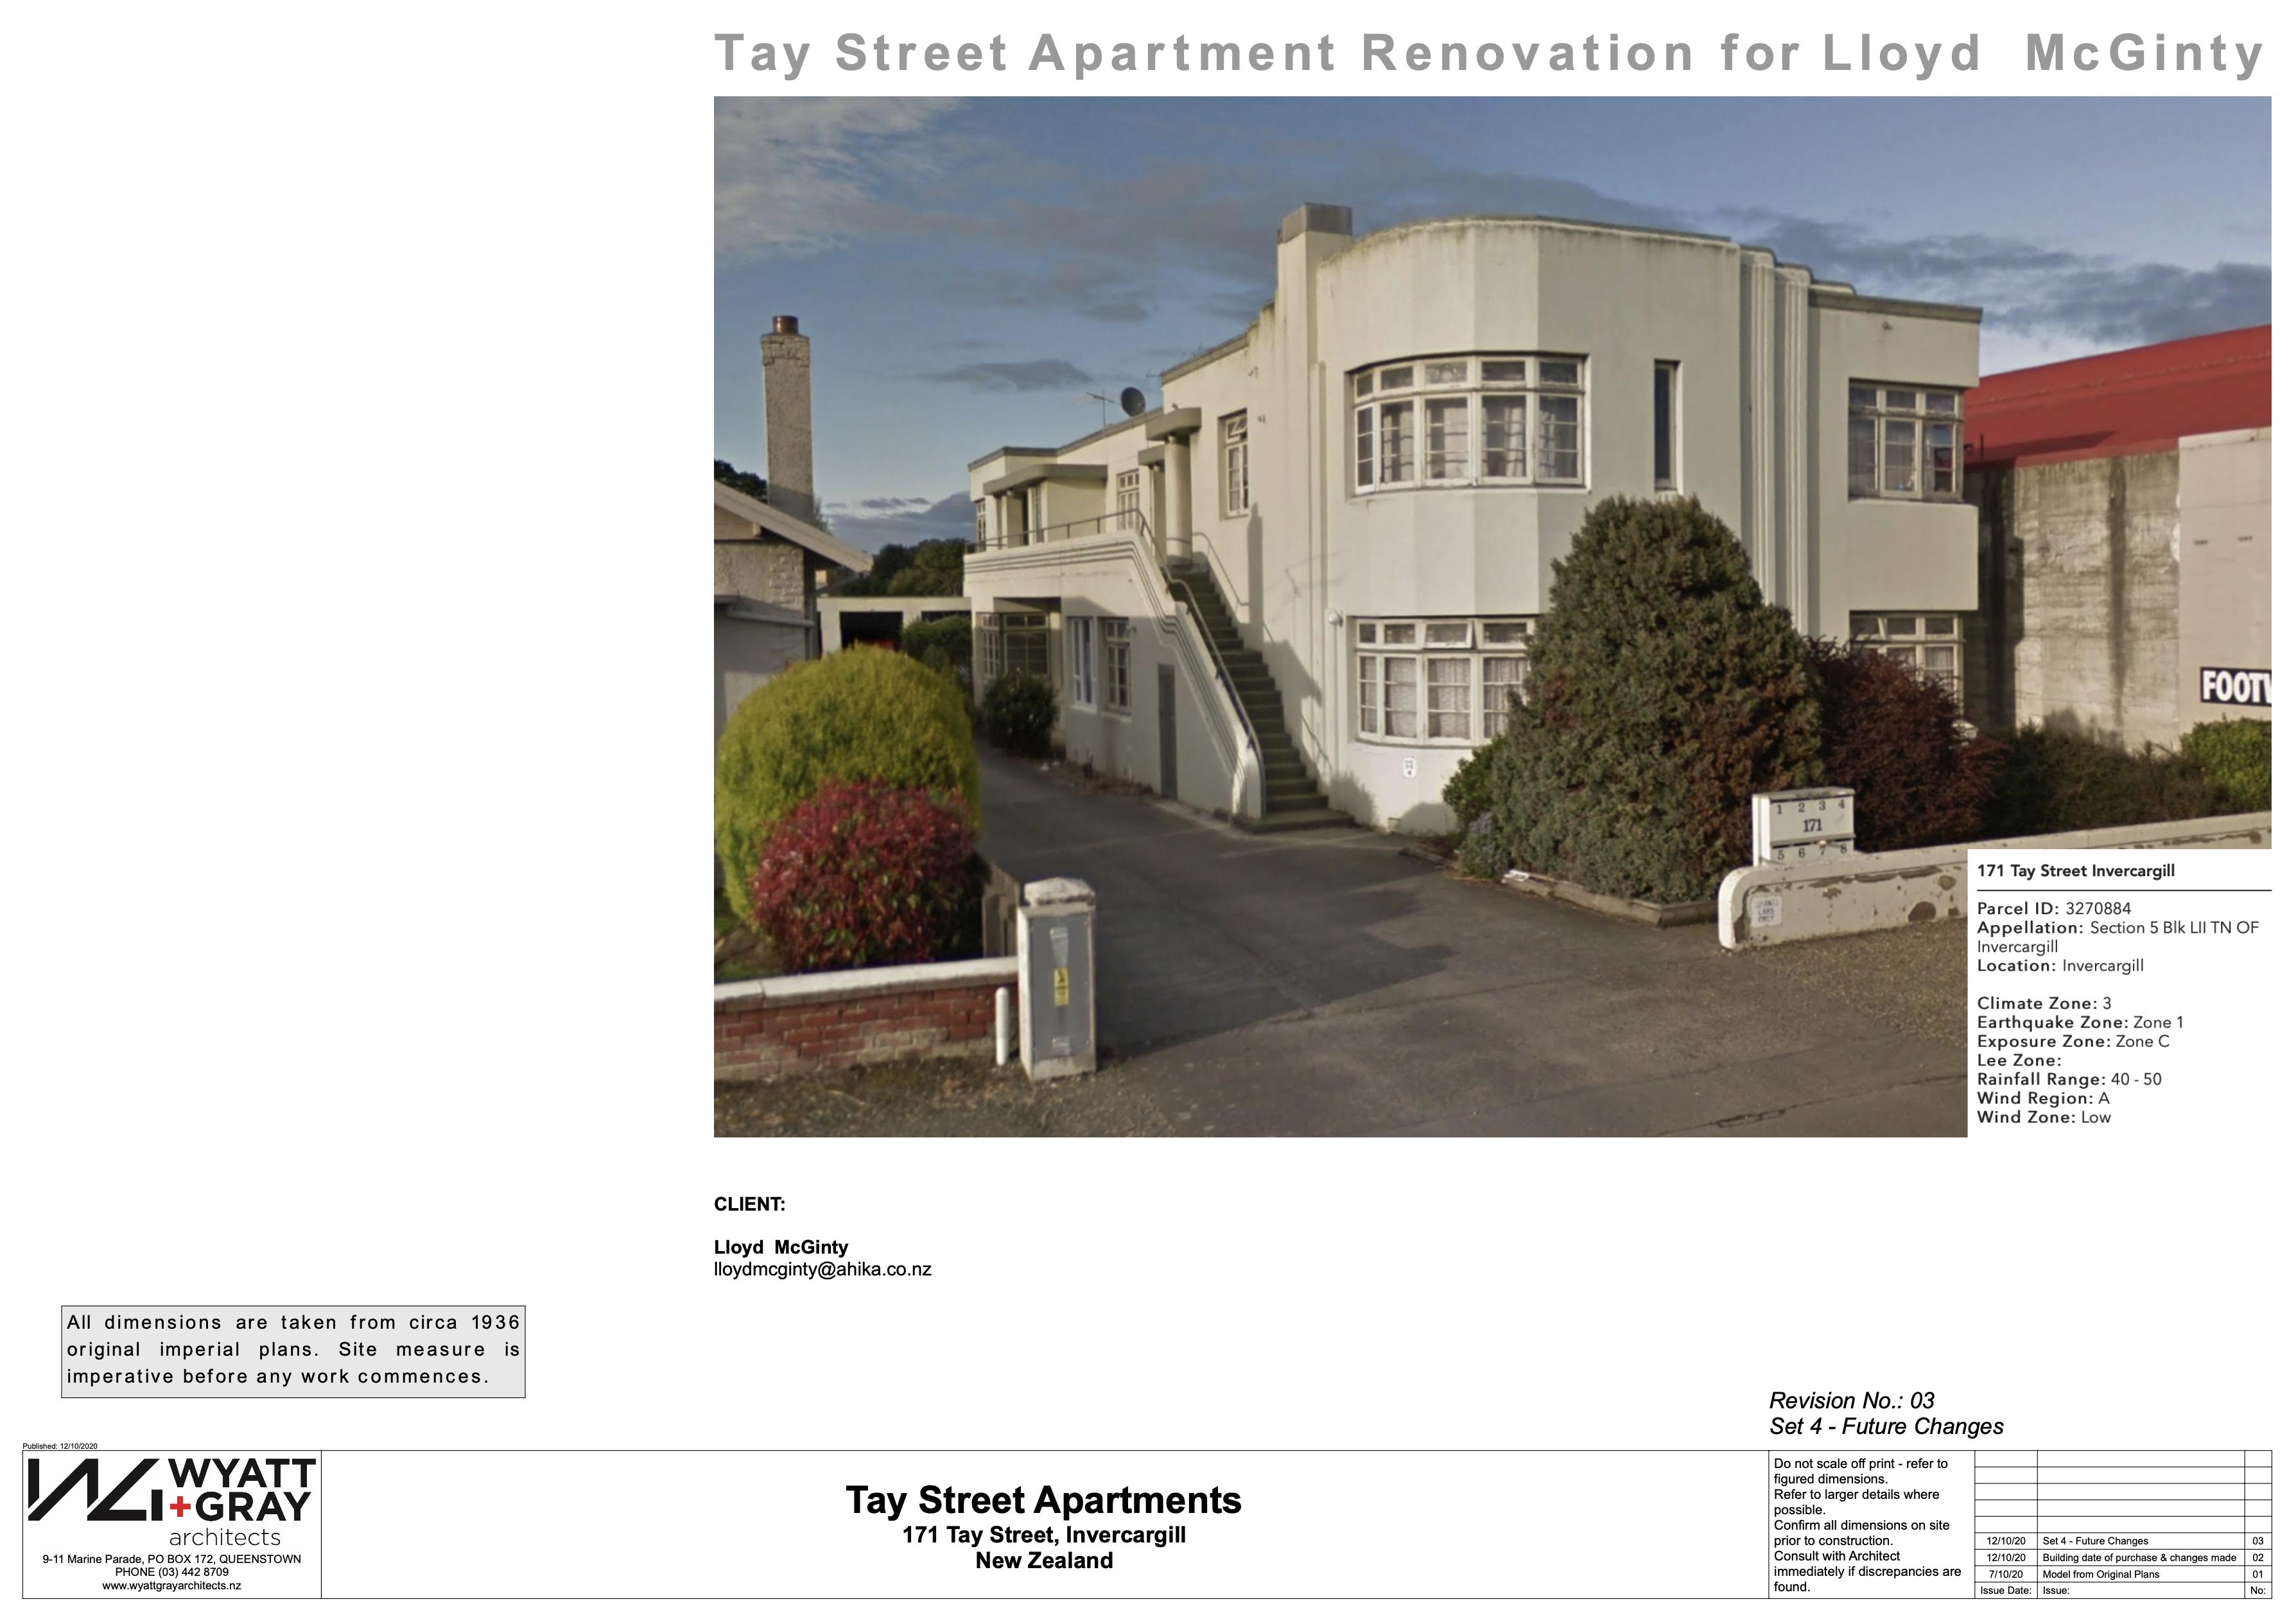 Tay St Apartment - Renovations